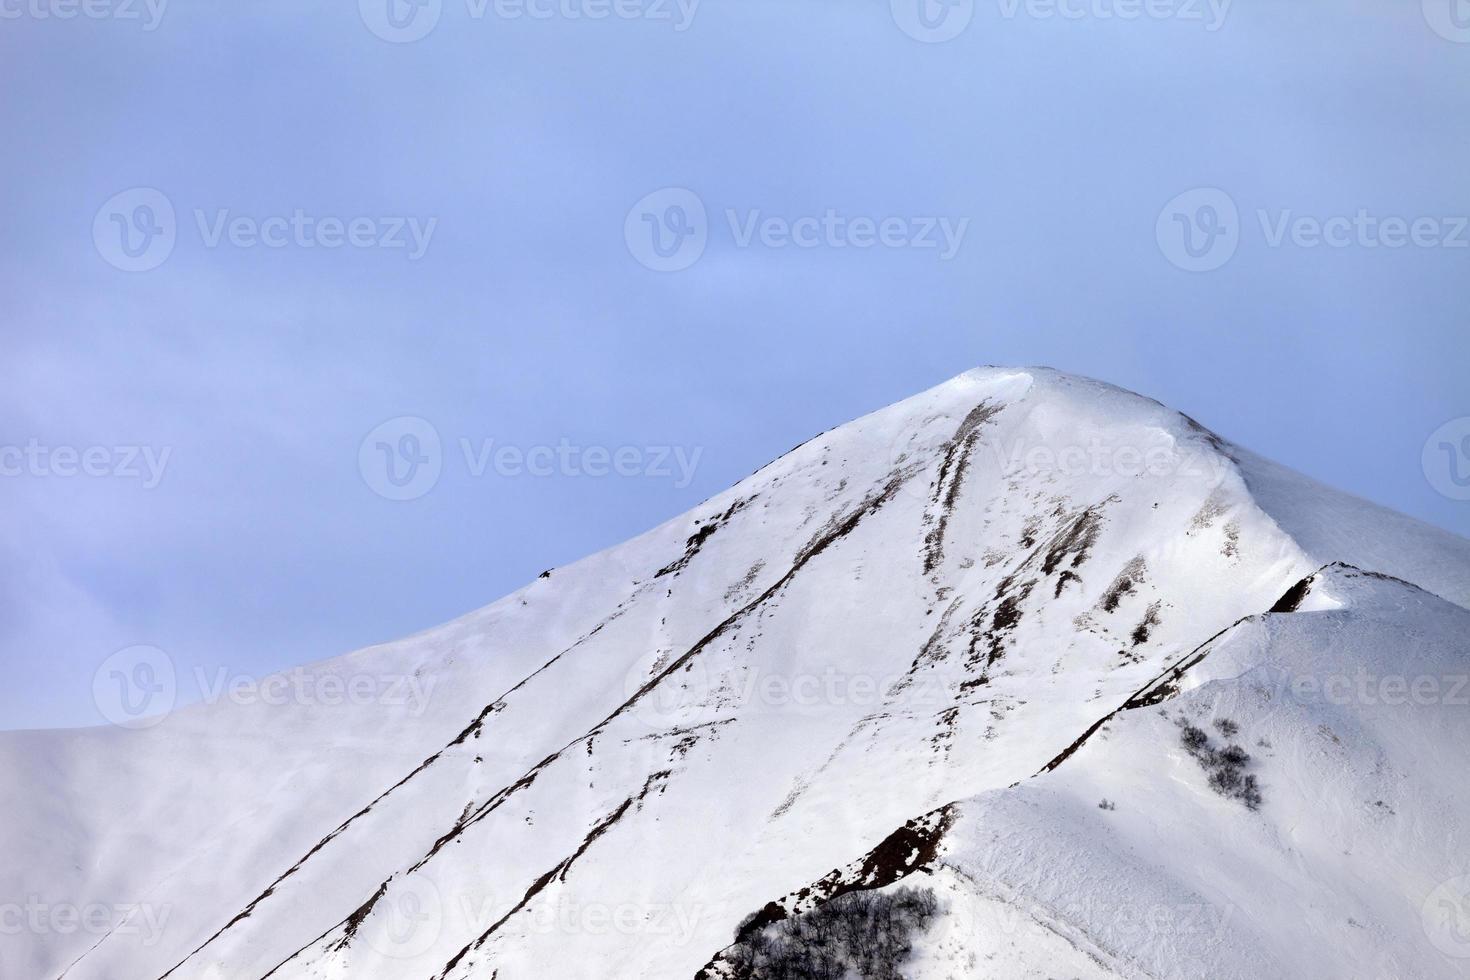 schneebedeckter Hang abseits der Piste am Morgen foto